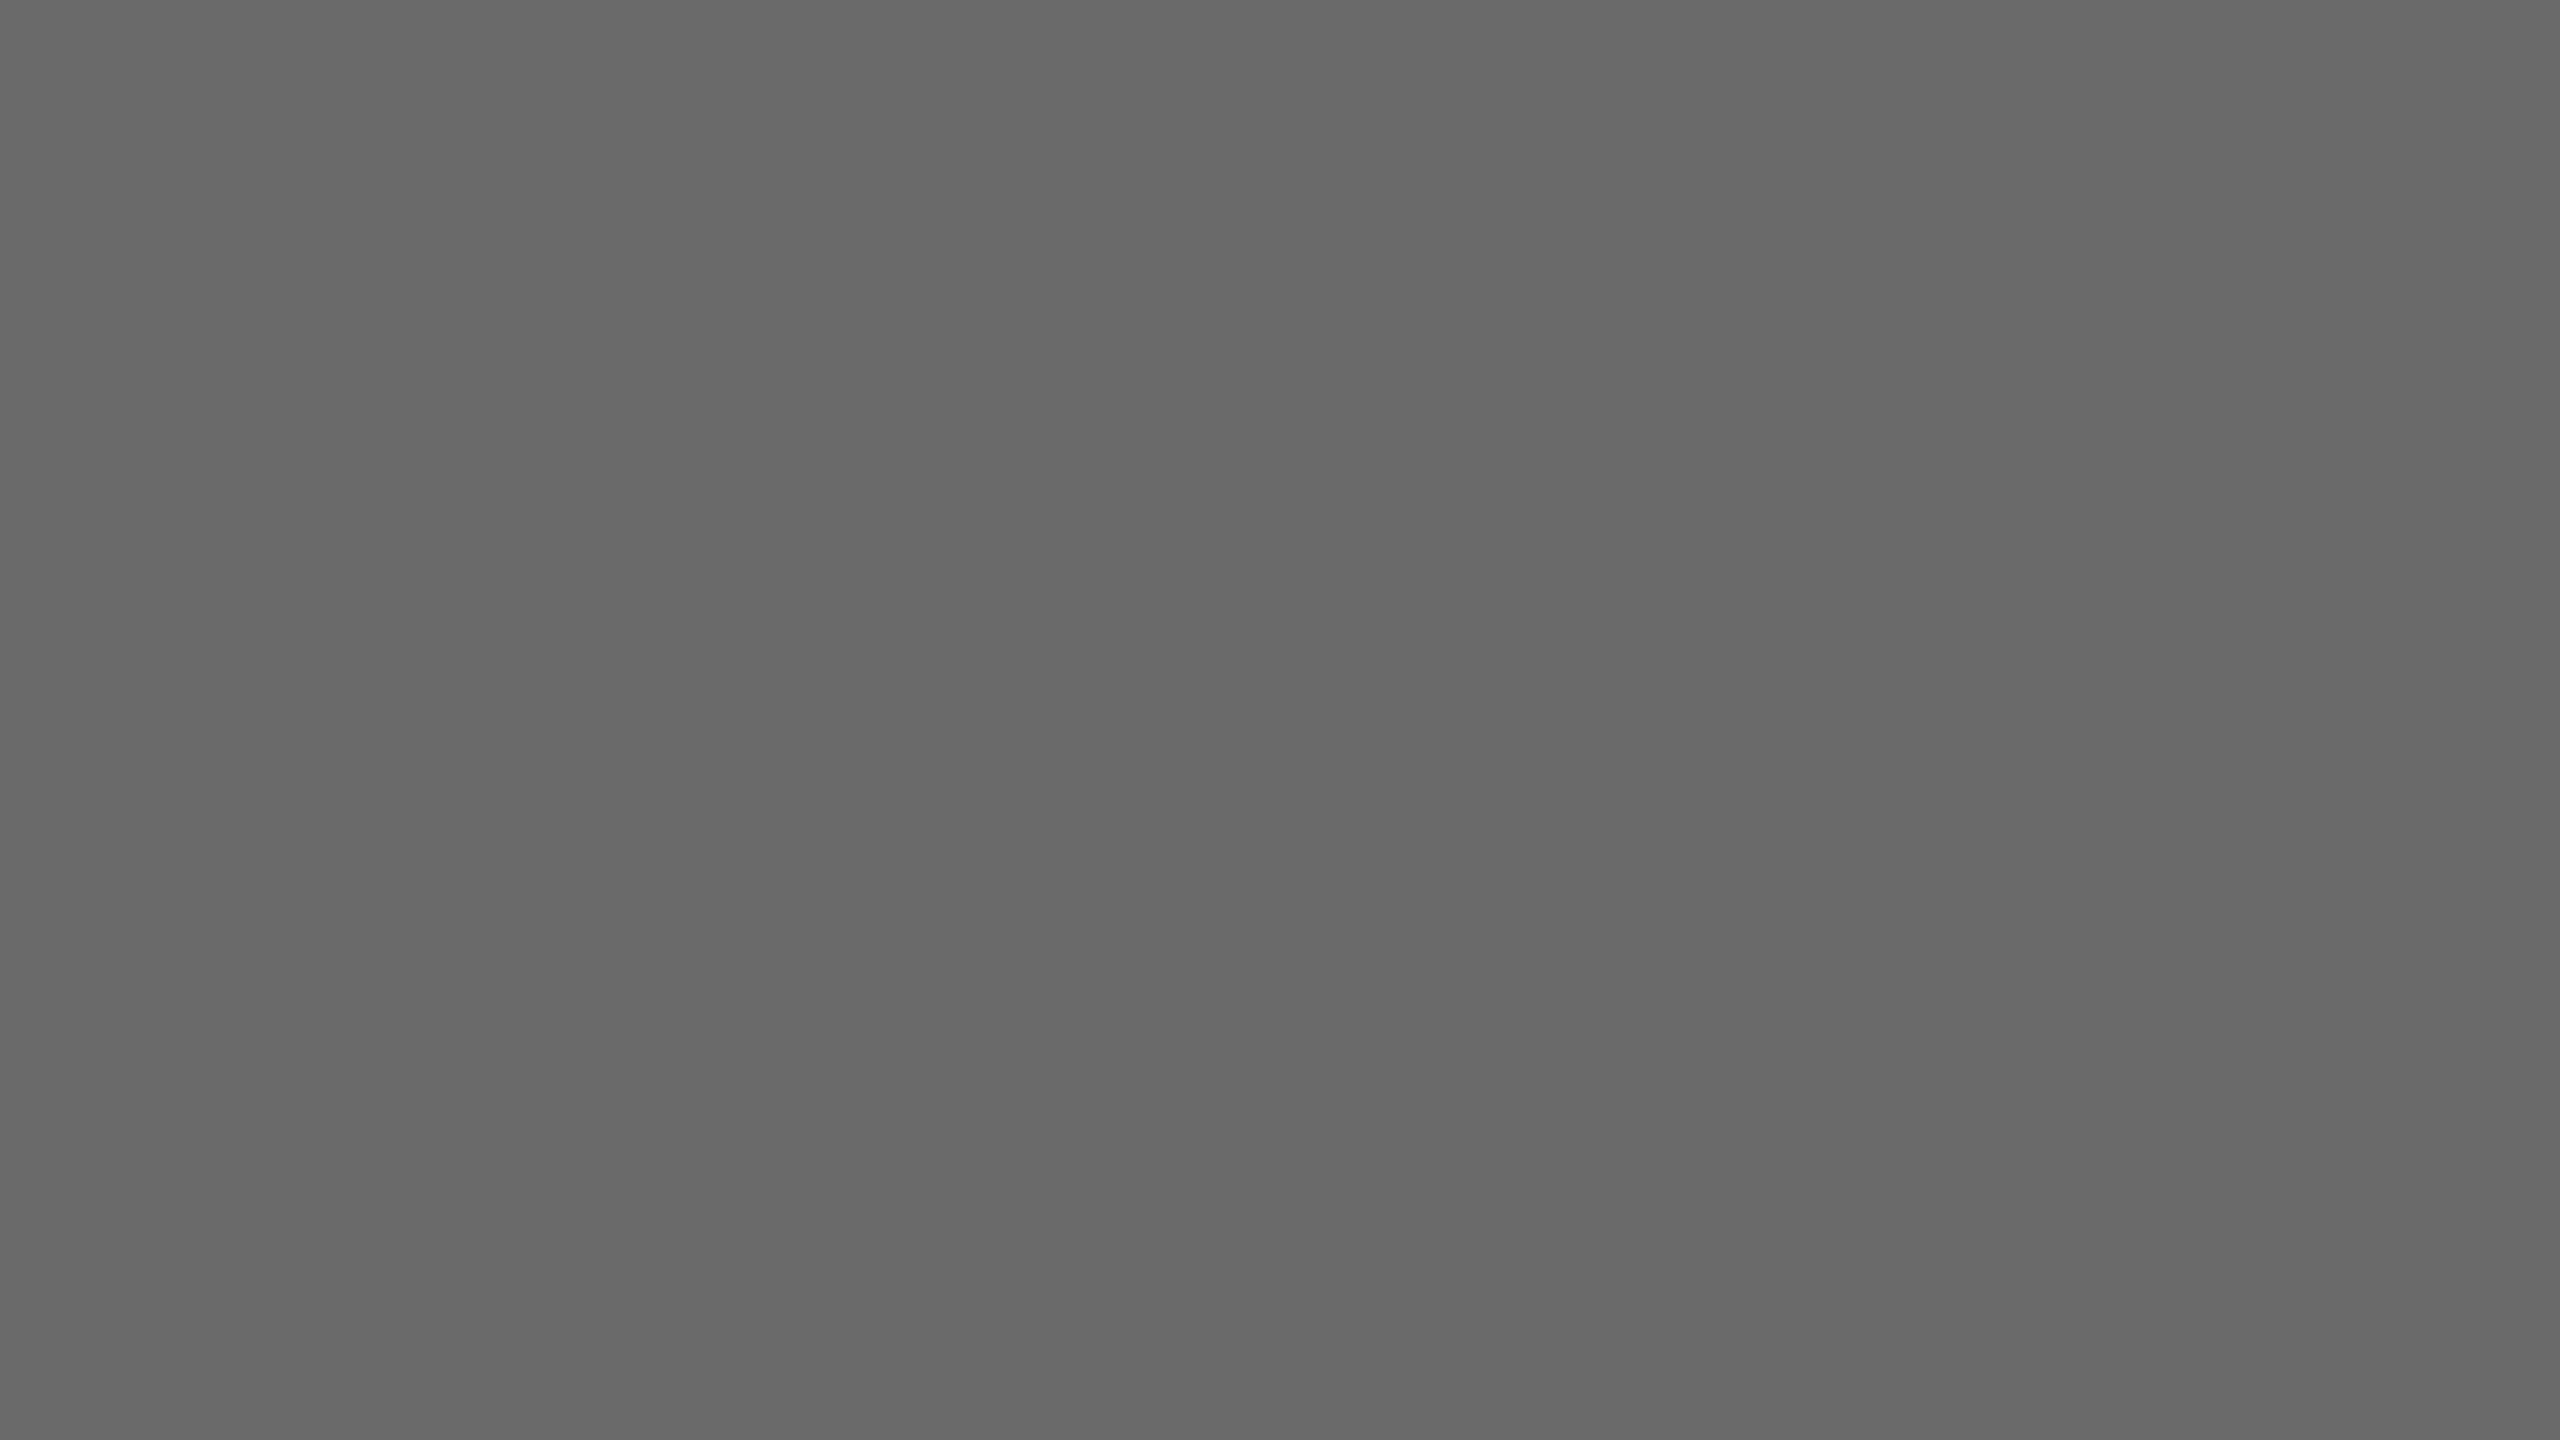 Lovely Wallpaper Grey Desktop Photographic  gt;gt;gt; Best Wallpaper HD Star Wars 7 Wallpapers Funny